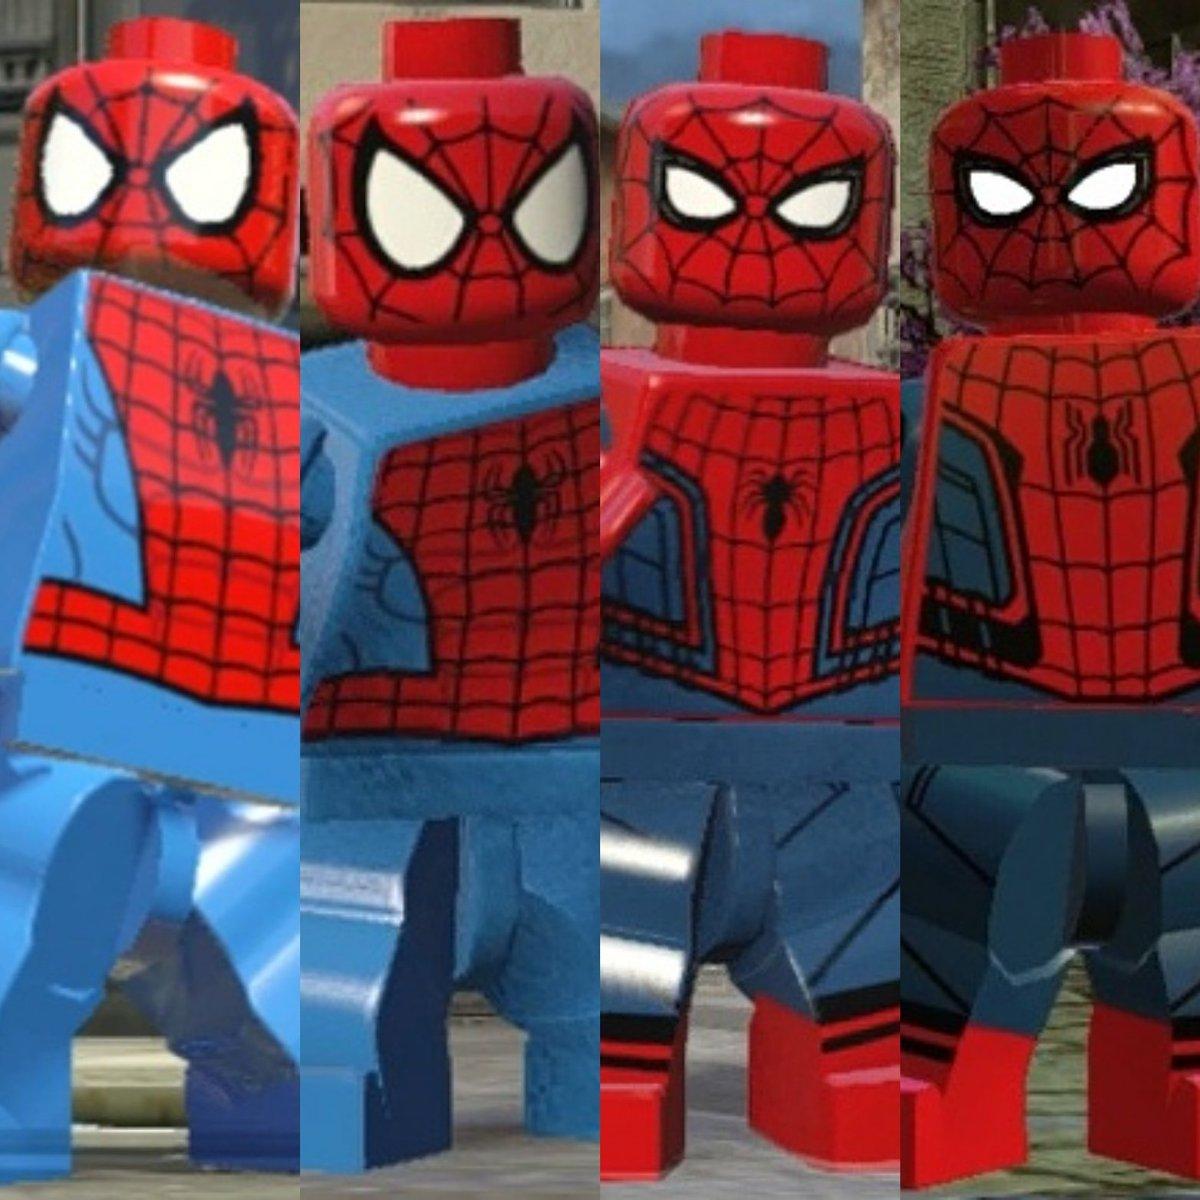 Mario Power On Twitter Lego Spiderman Evolution Httpstco